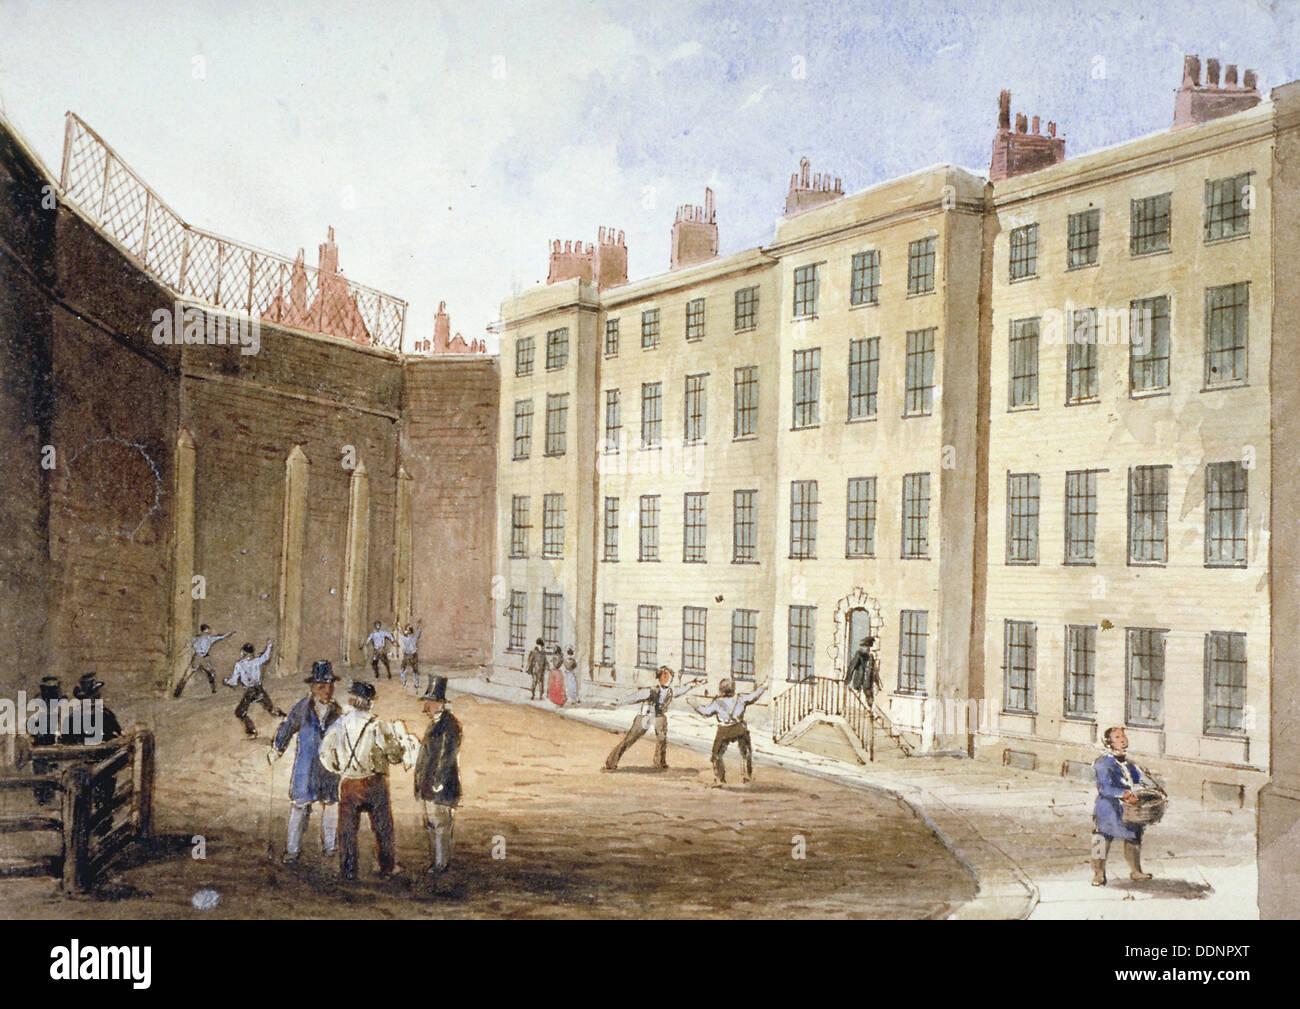 View of Fleet Prison from the tennis ground, City of London, 1845. Artist: Thomas Hosmer Shepherd Stock Photo